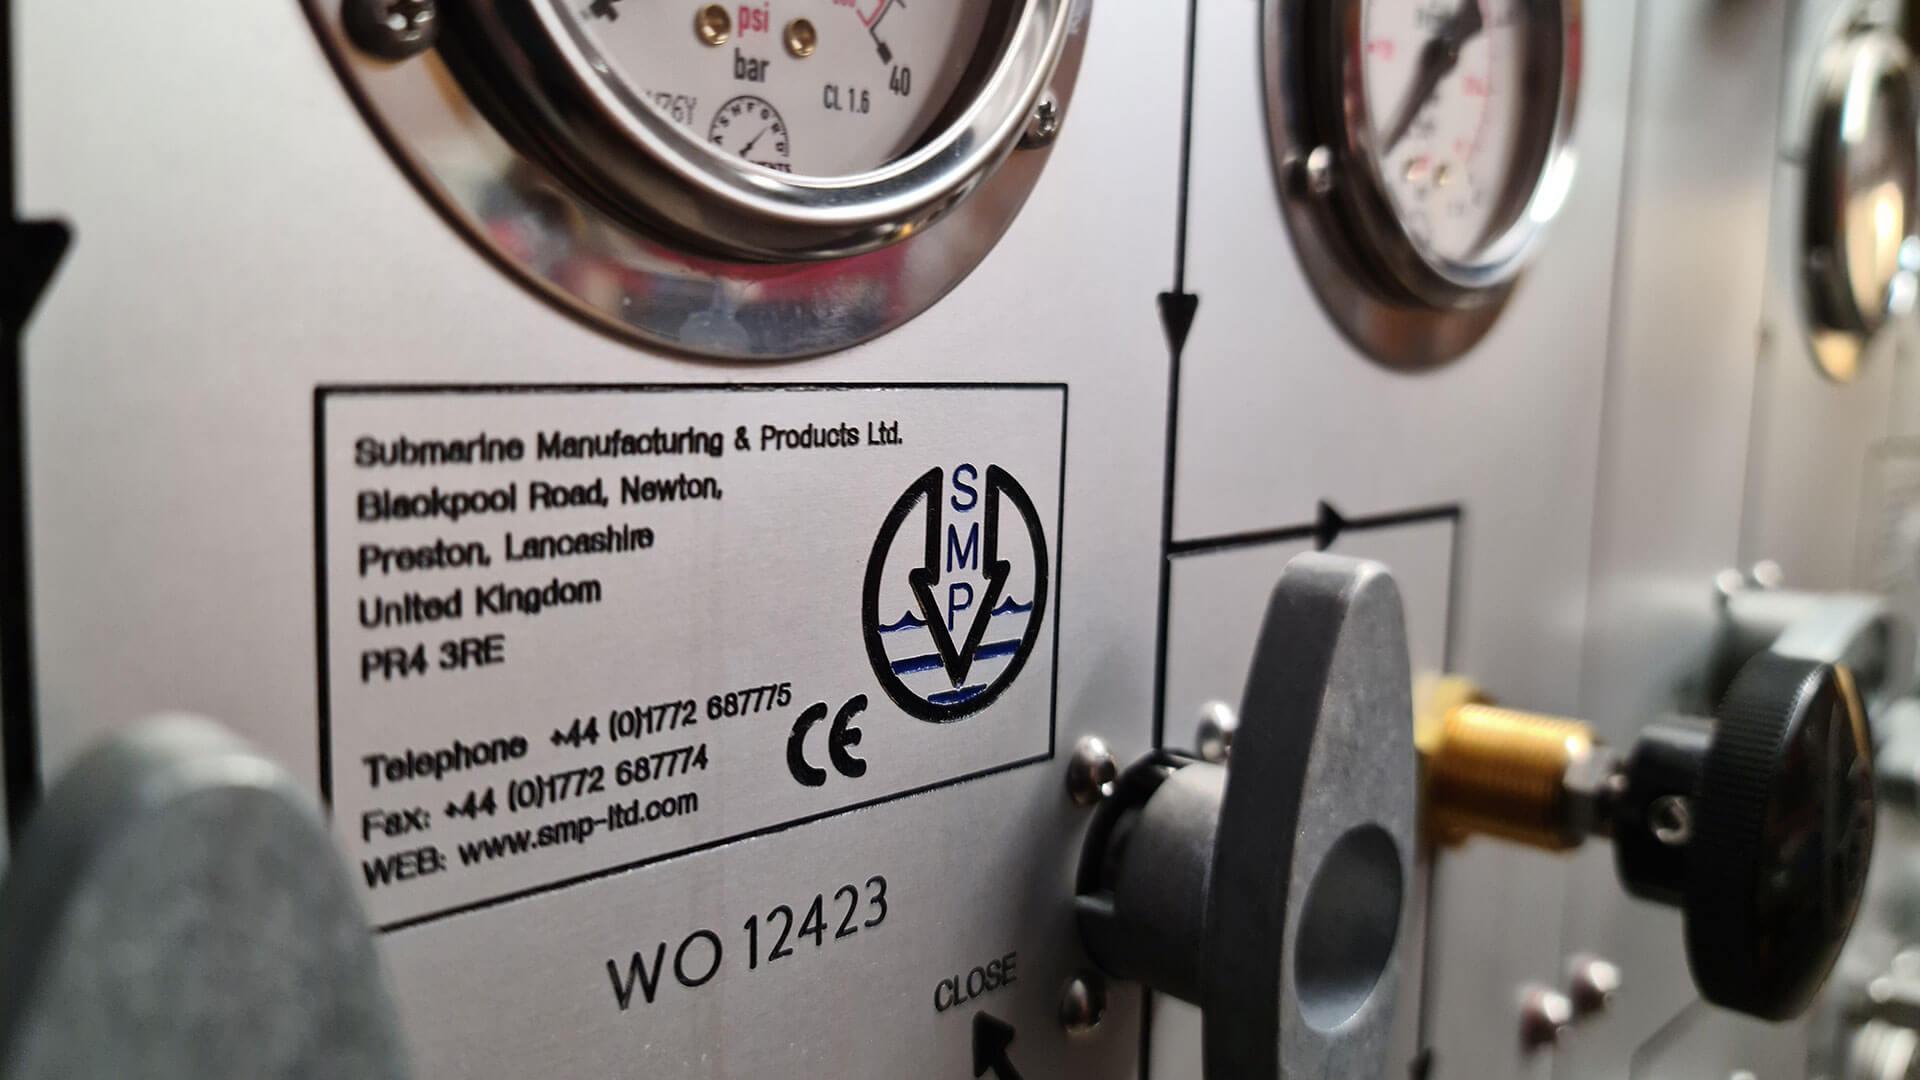 bespoke divers nitrox/air panel